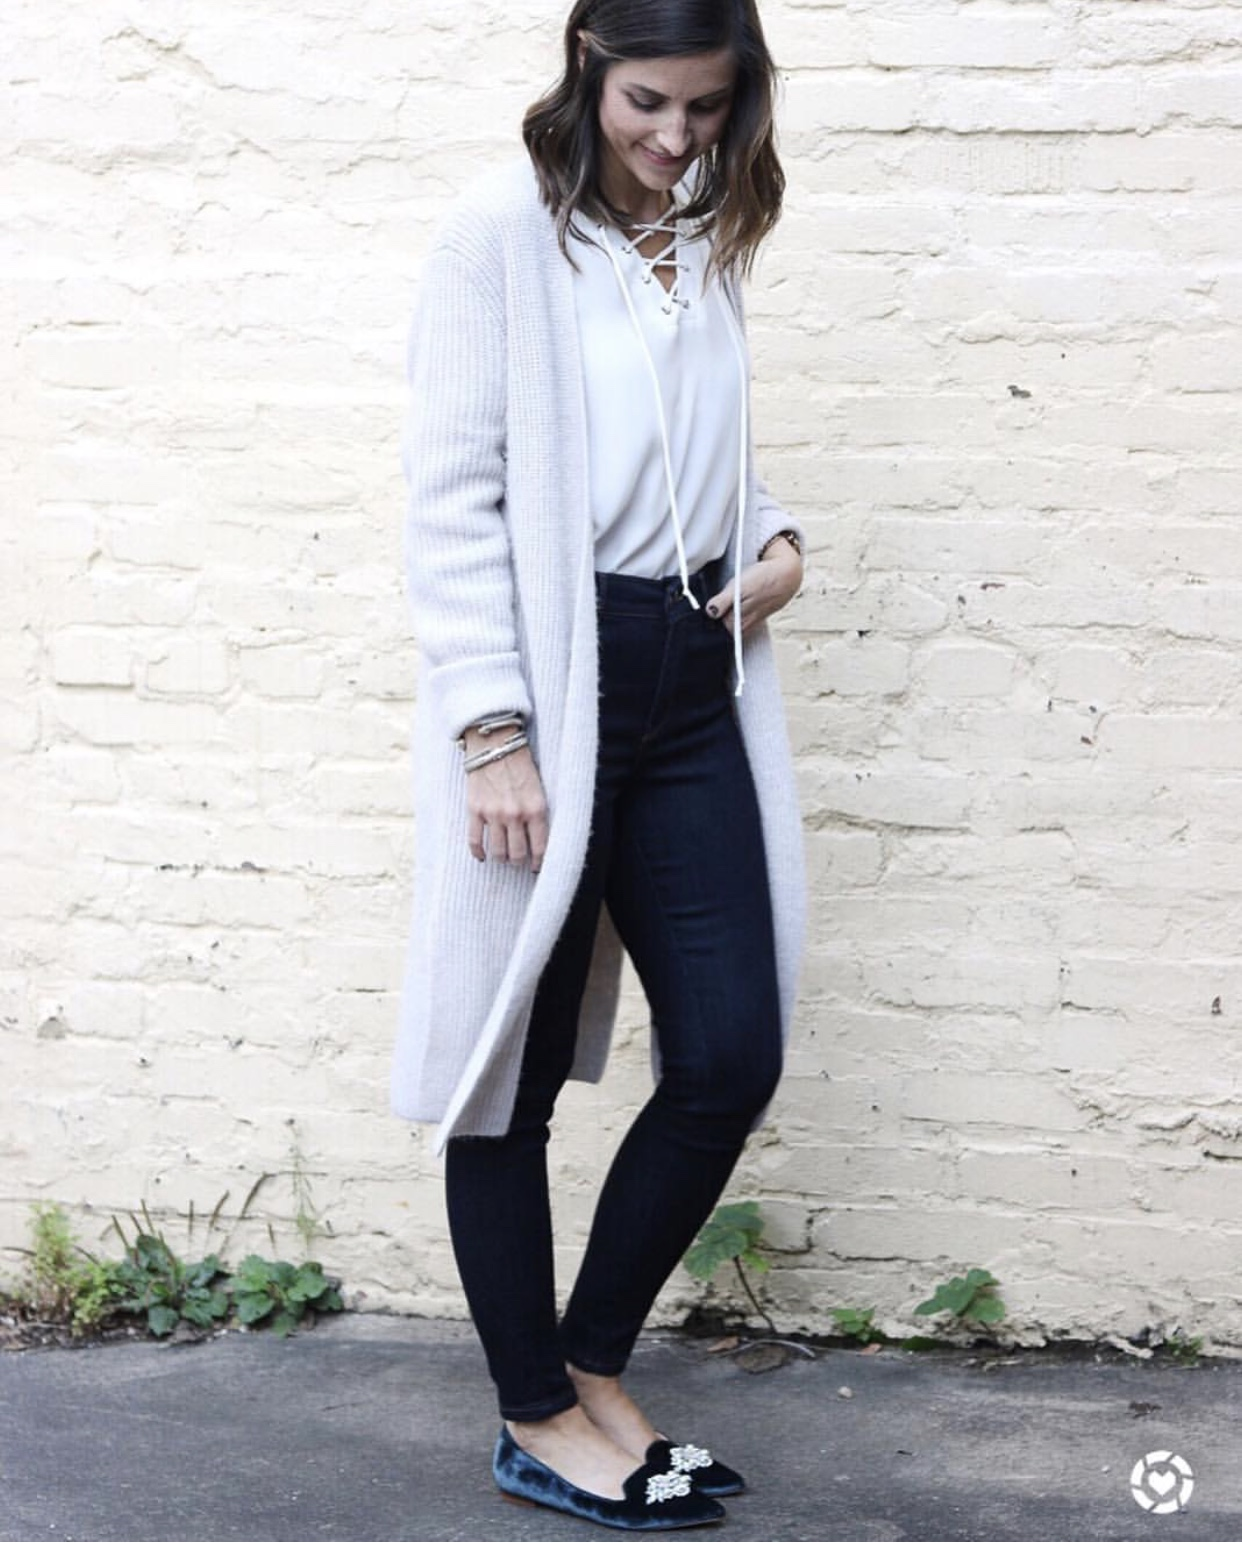 Cozy Long Cardigan - Instagram Fashion Lately by Washington DC fashion blogger Cobalt Chronicles